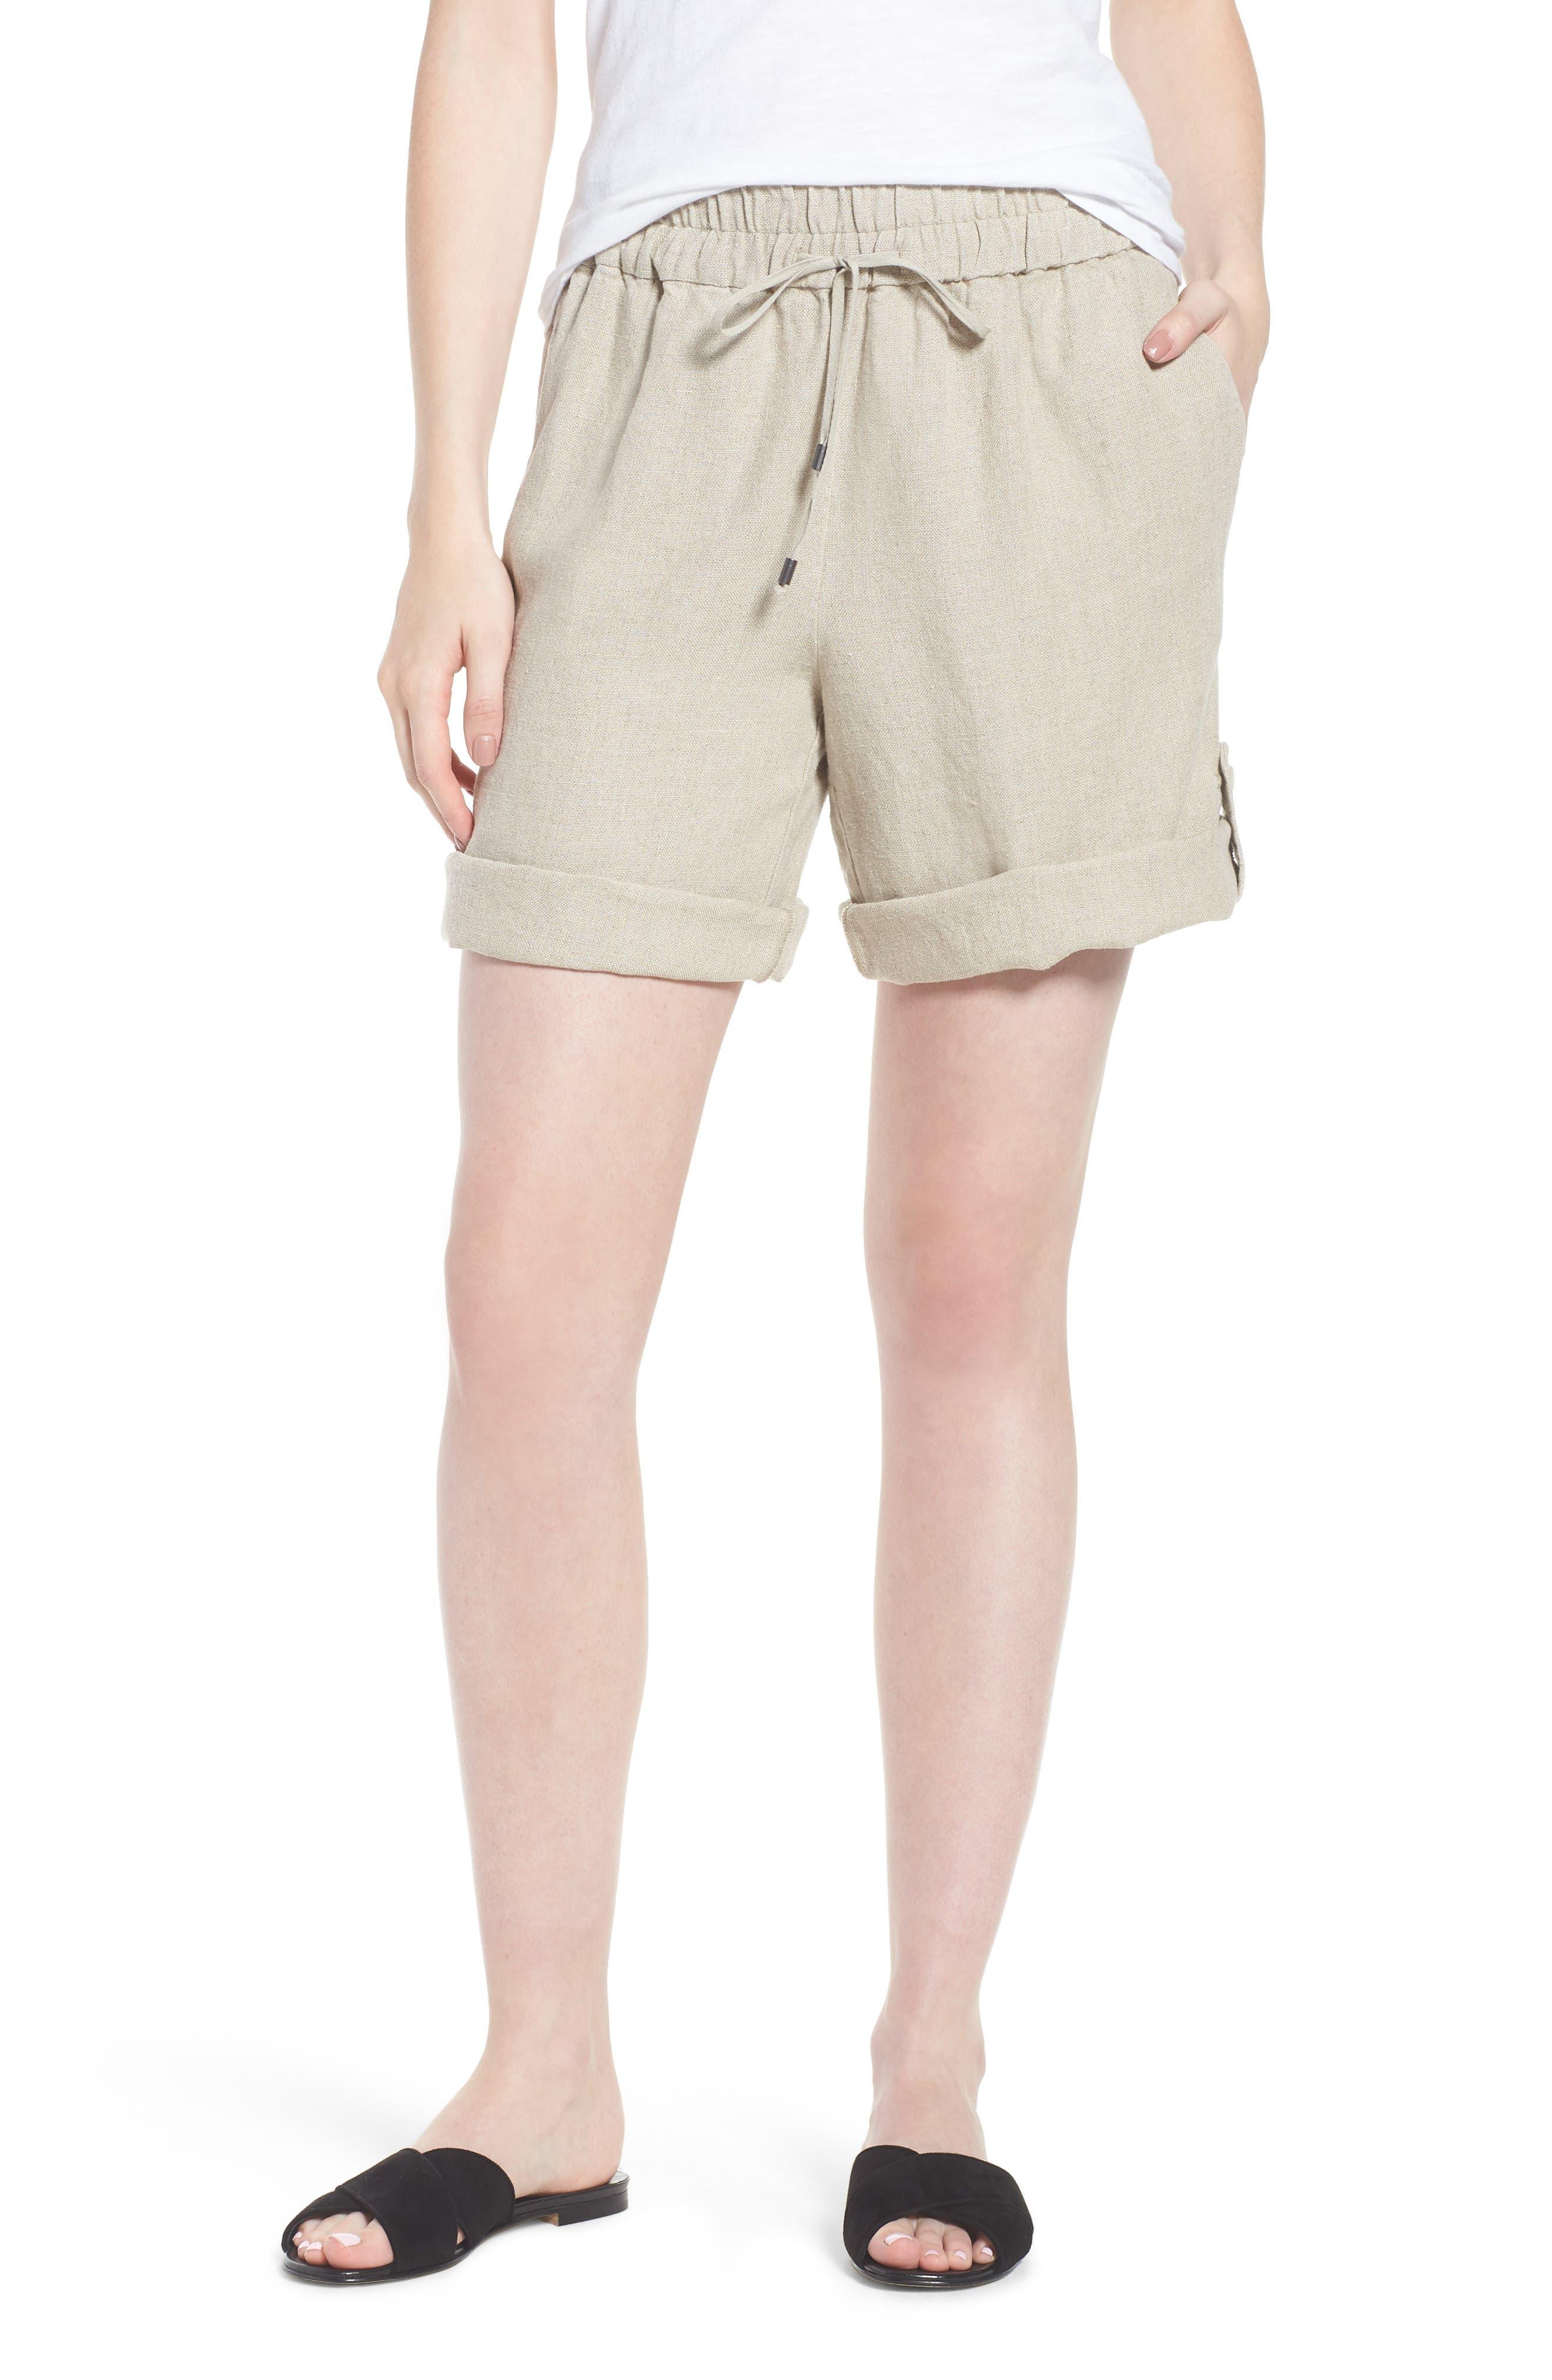 Rolled Organic Linen Shorts,                             Main thumbnail 1, color,                             Undyed Natural